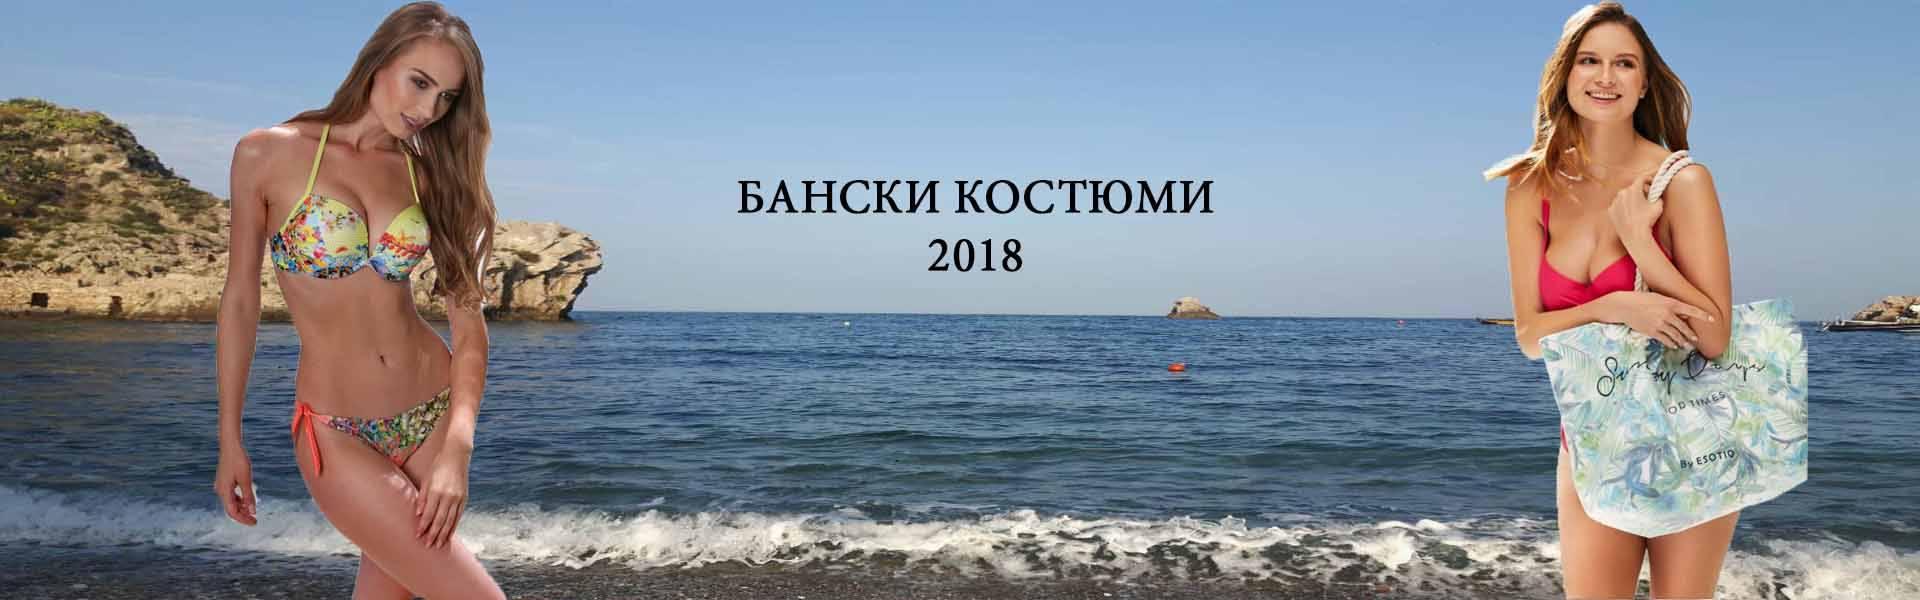 Бански костюми колекция 2018